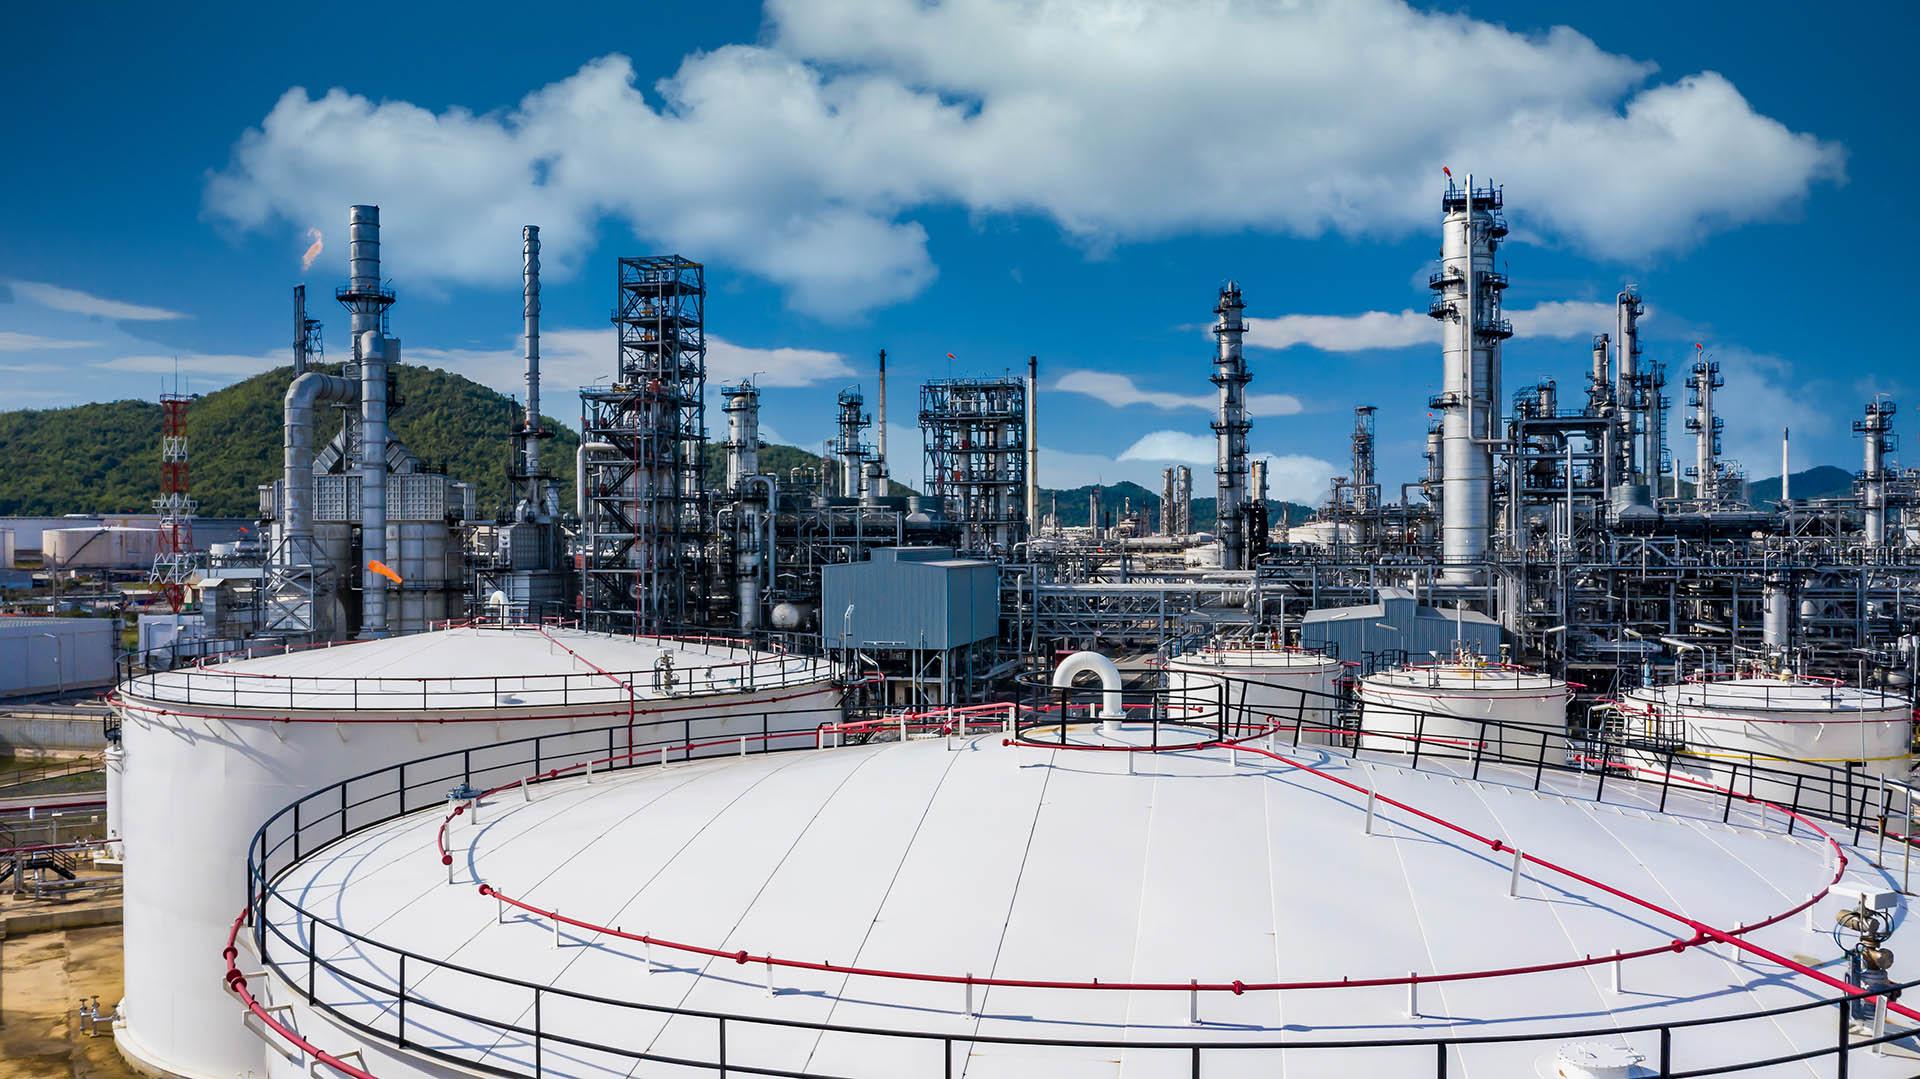 Gas refinery storage tank petrochemical